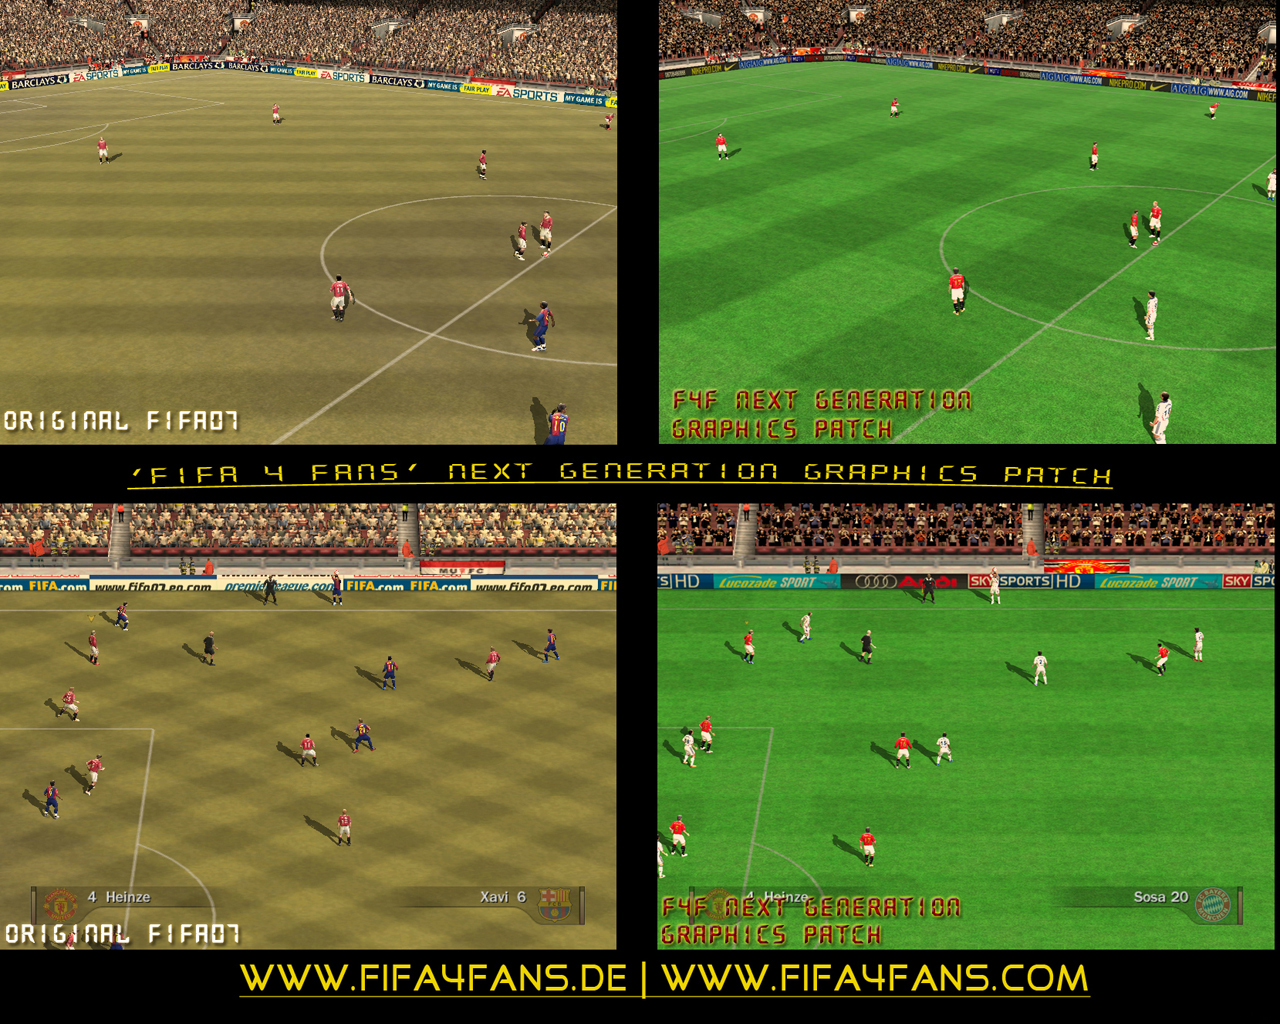 Gráficos Nextgen para FIFA07 links 2020 Next_generation_gaphic_patch2